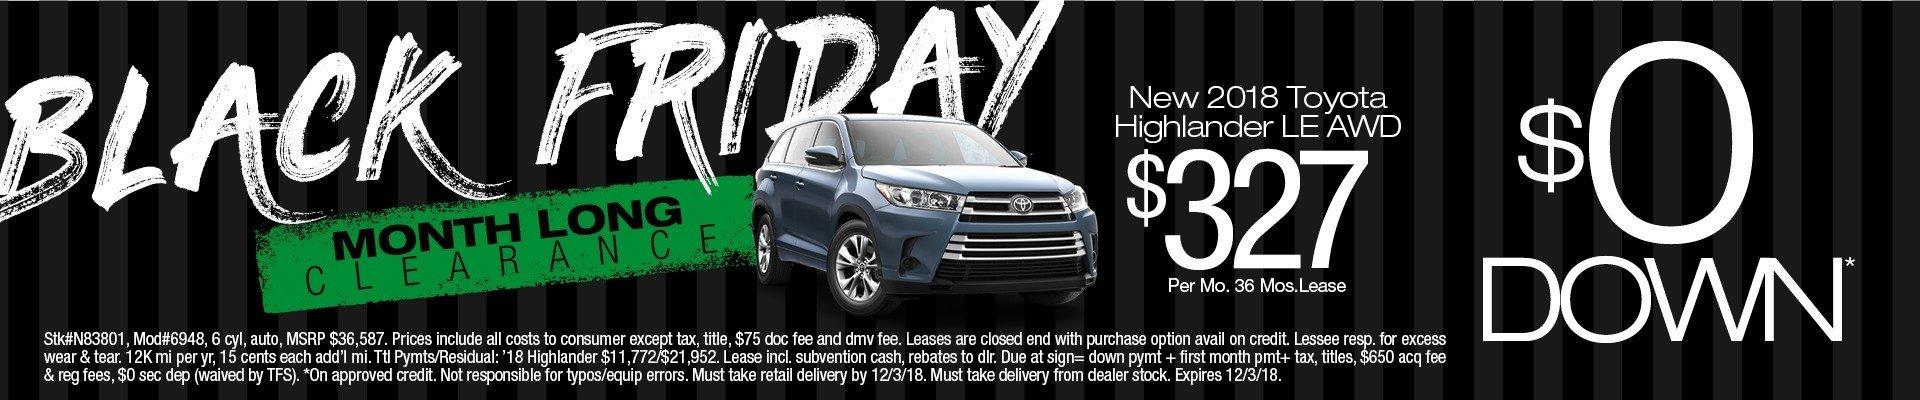 2018 Toyota Highlander Lease $0 Down